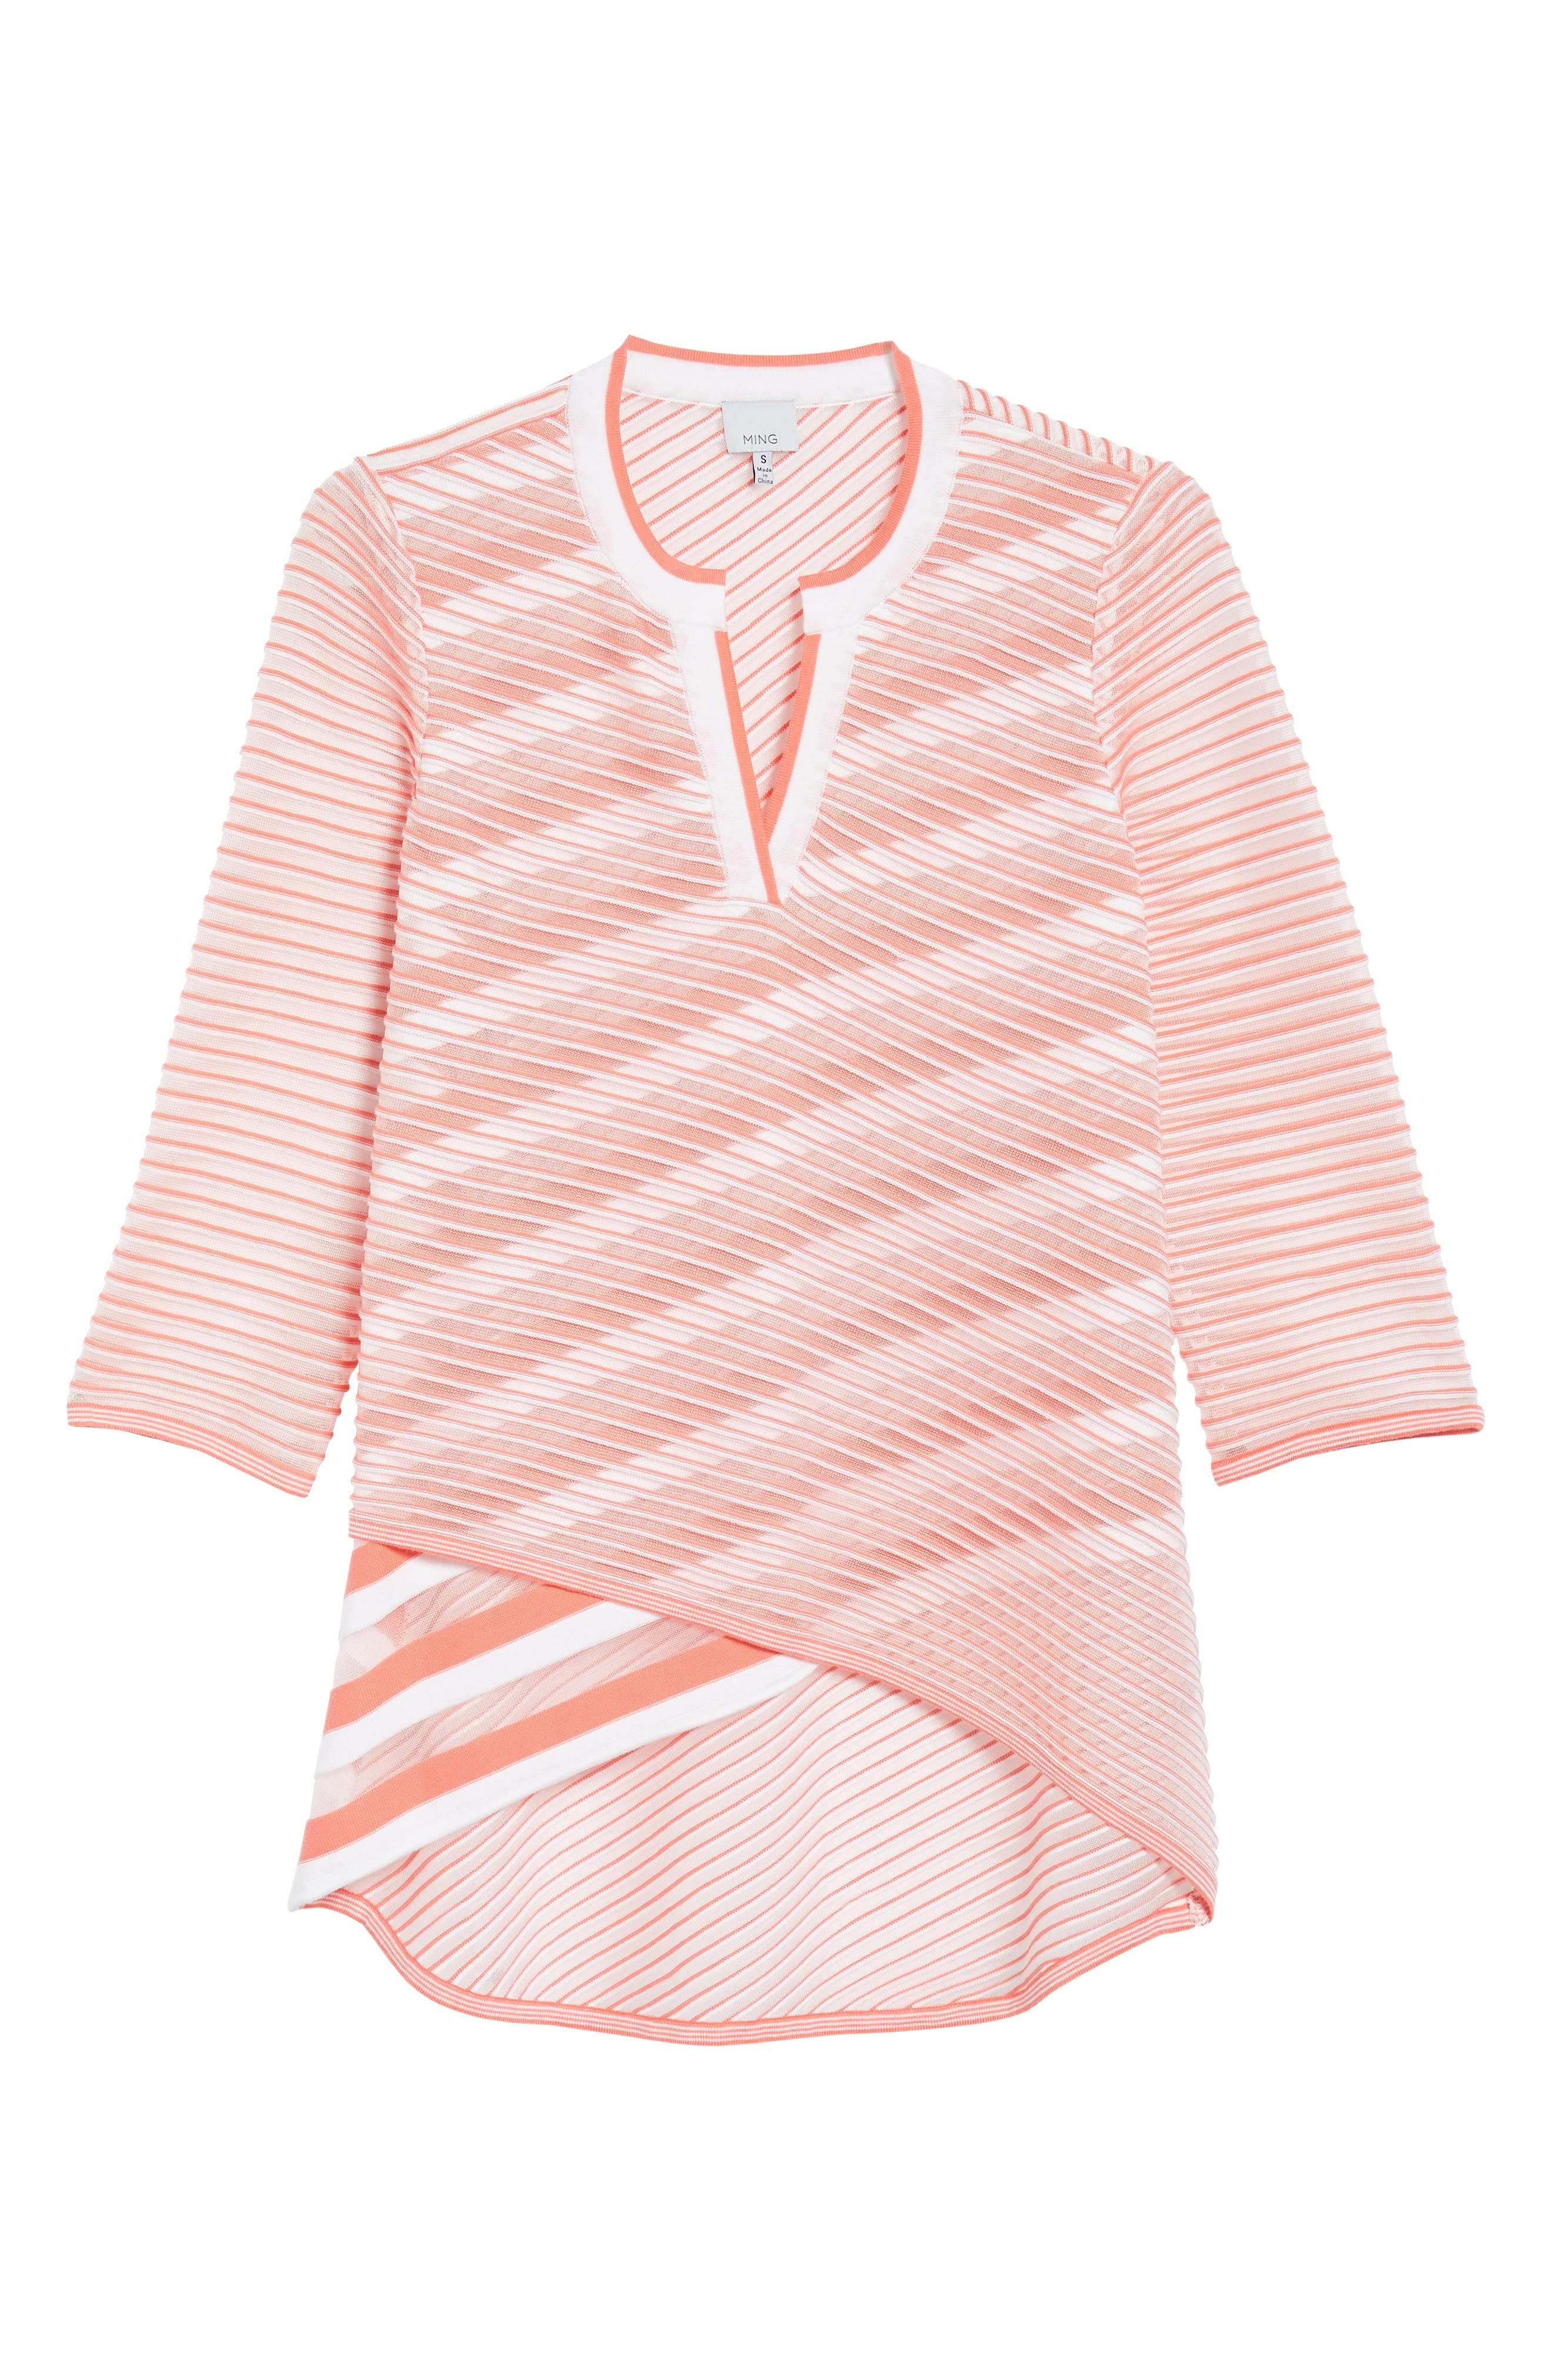 Sheer Stripe Knit Tunic,                             Alternate thumbnail 6, color,                             Daylily/ White